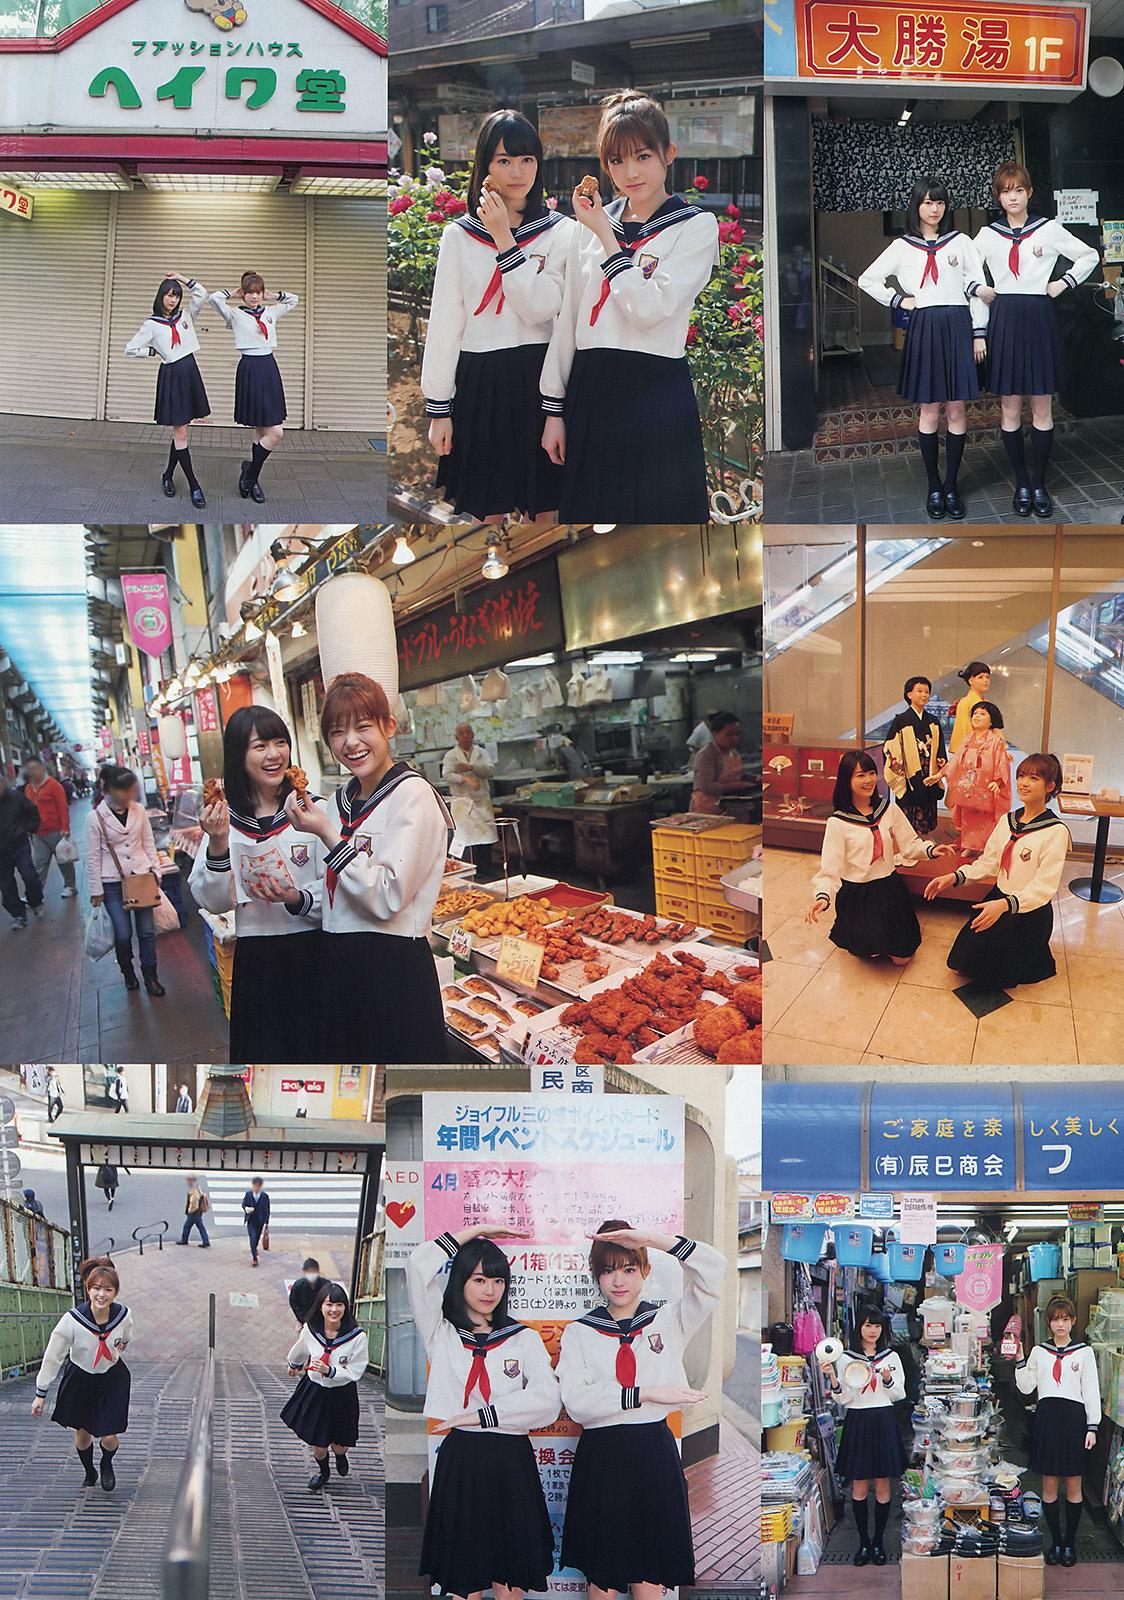 Ikuta Erika 生田絵梨花 x Matsumura Sayuri 松村沙友理 Big Comic Spirits 2016 No 3 Pics 2